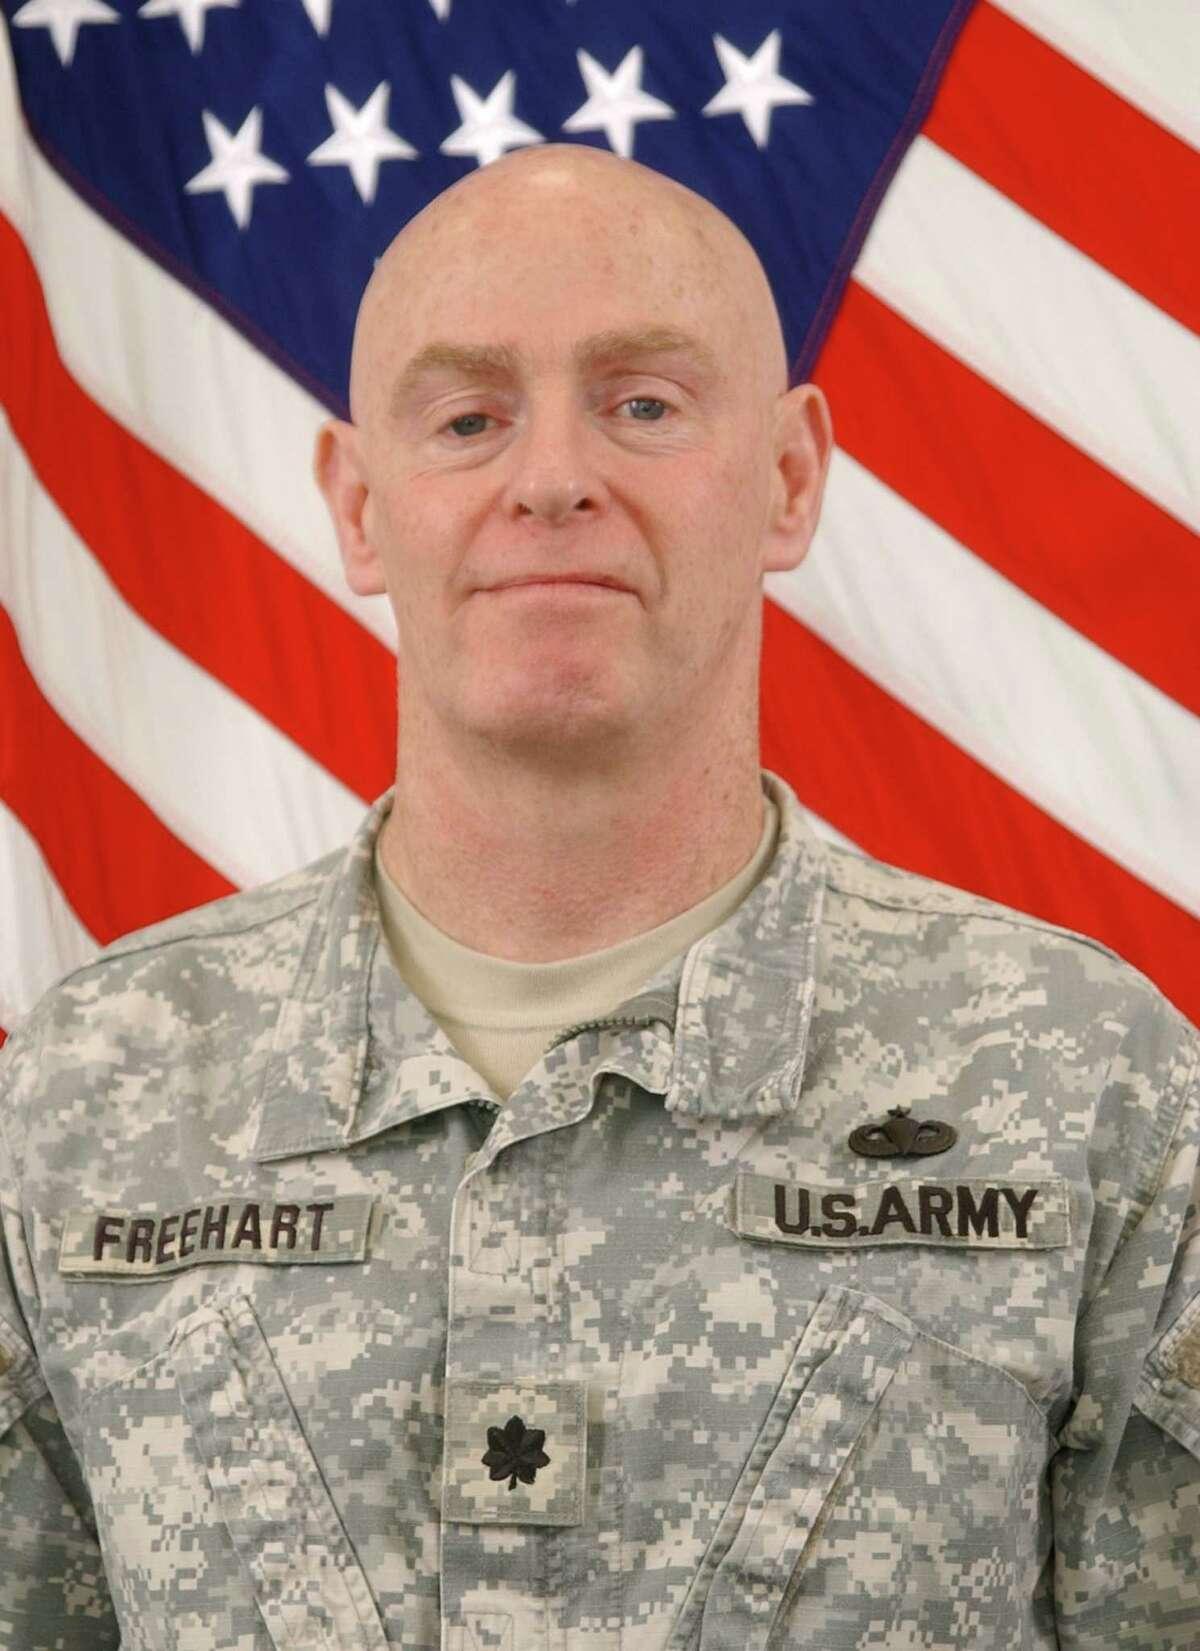 Lt. Col. James Freehart